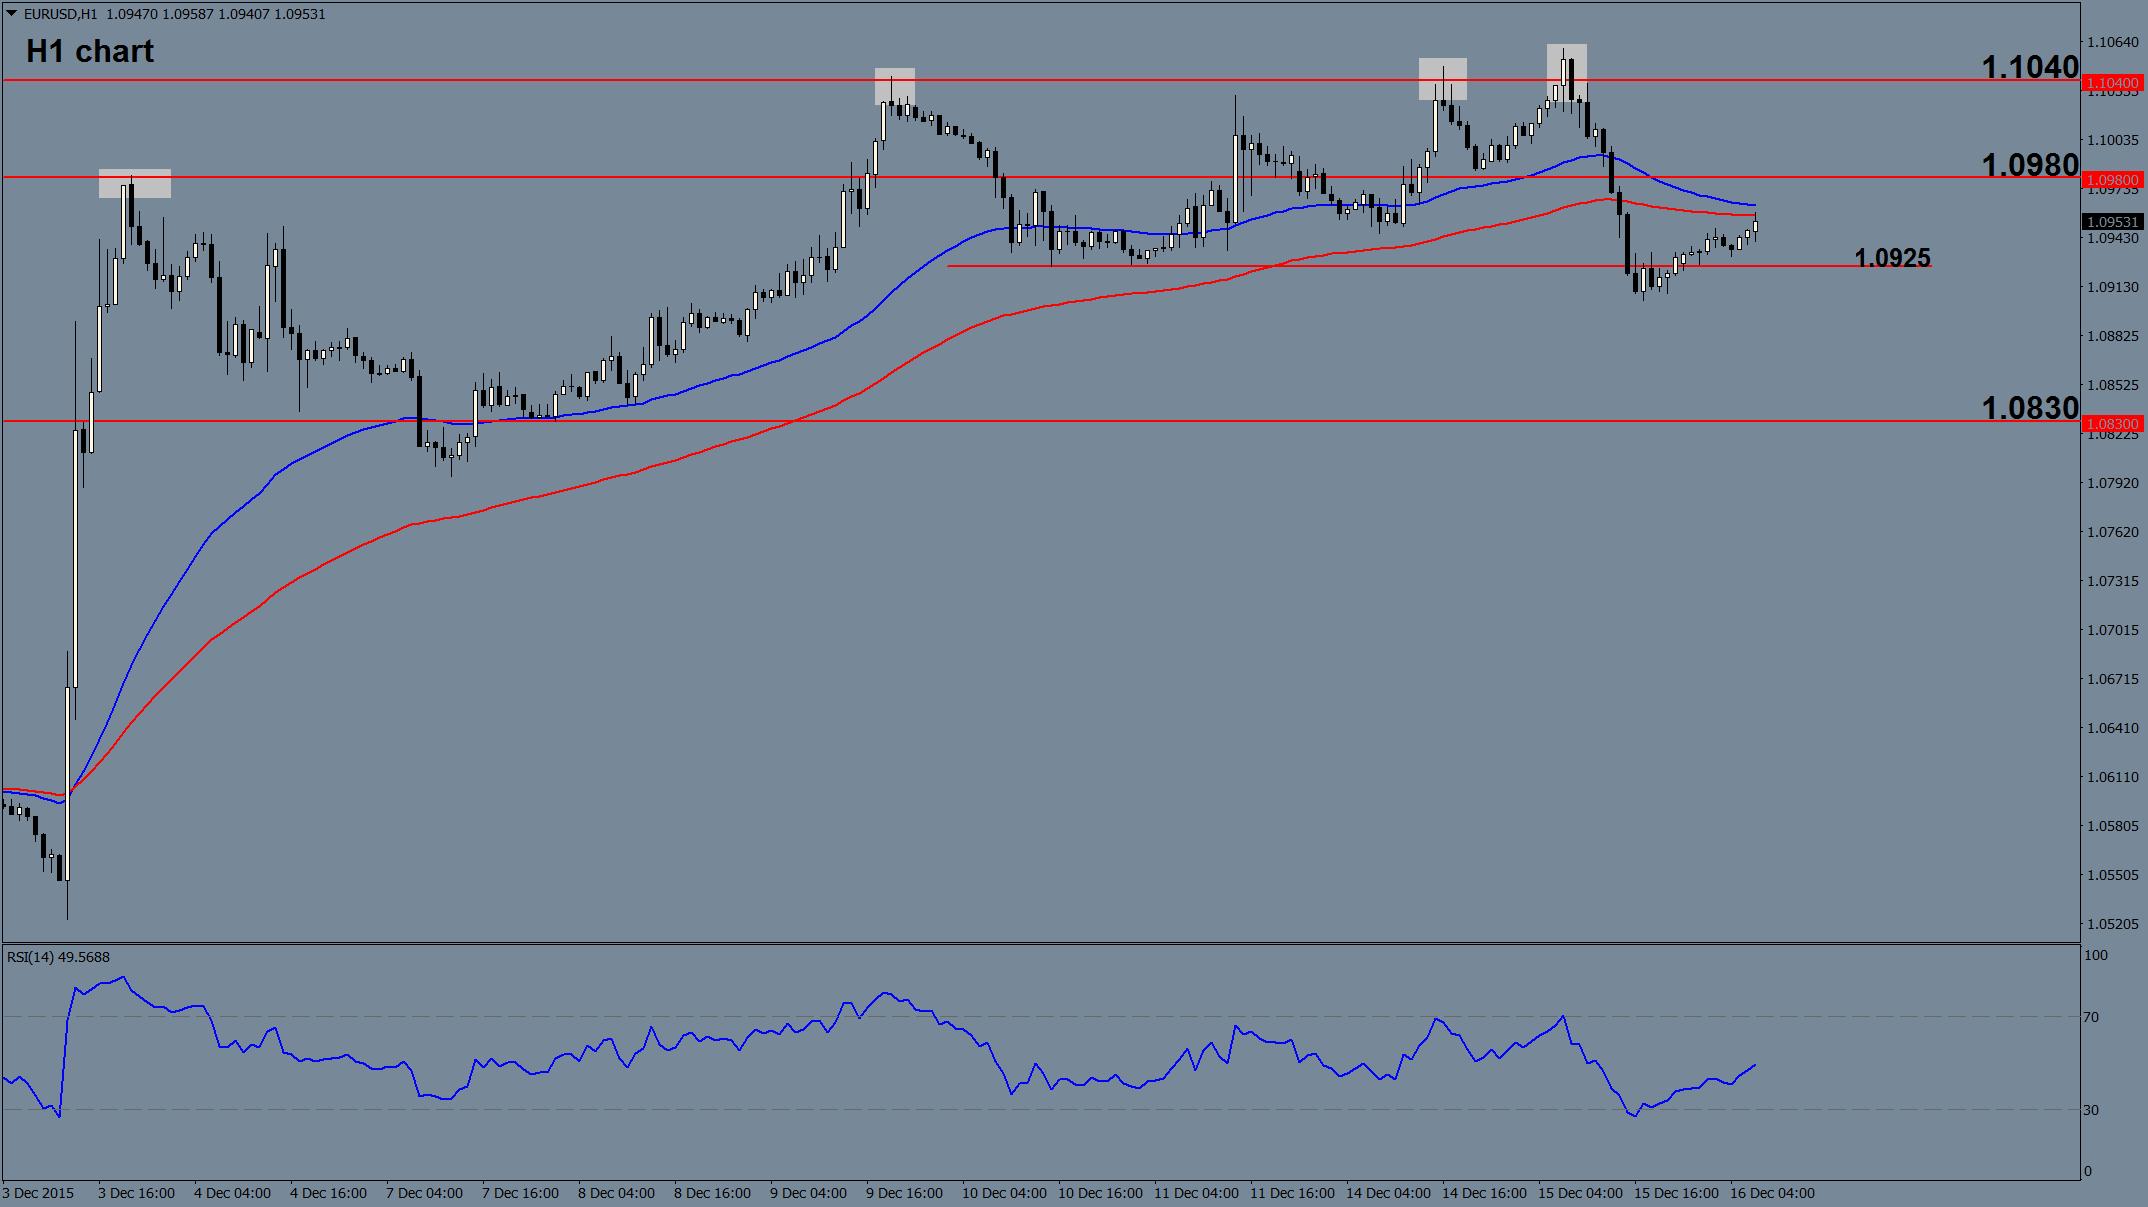 EUR/USD Forecast 16 Dec 2015